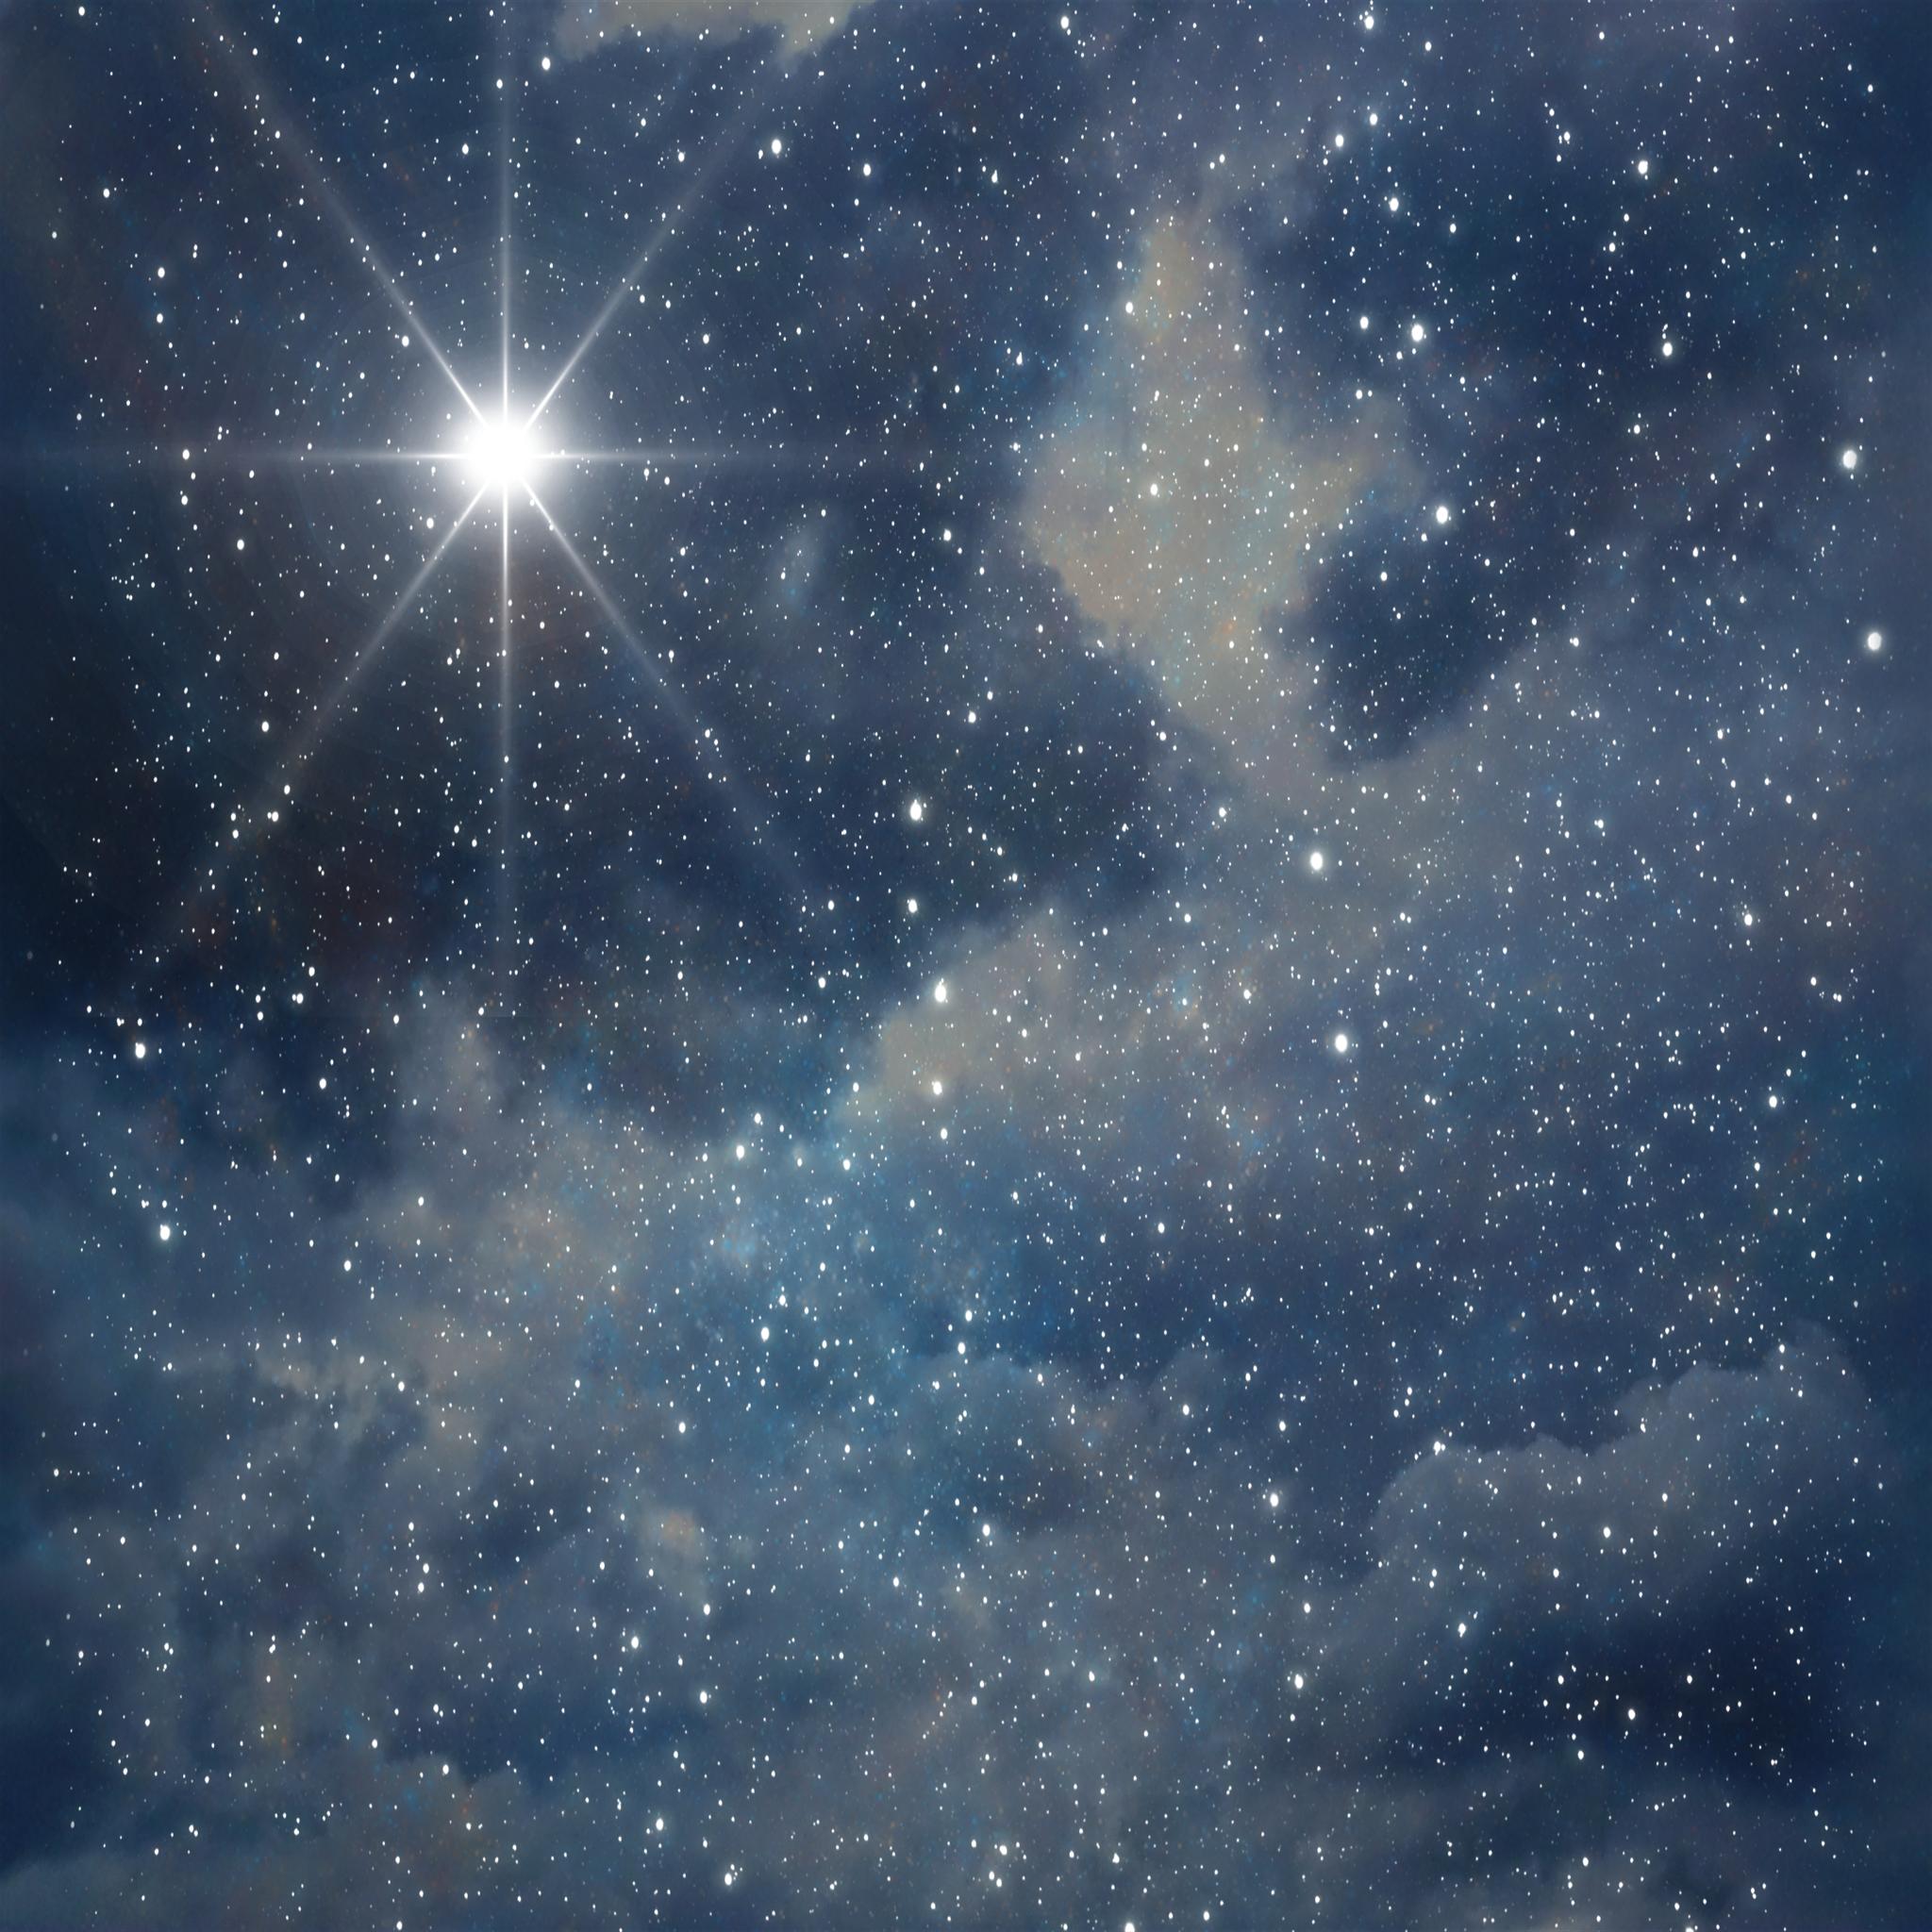 Background Night Sky By Templep2k2 D5kx59w Png 2 048 2 048 Pixels Night Sky Wallpaper Starry Night Wallpaper Night Skies